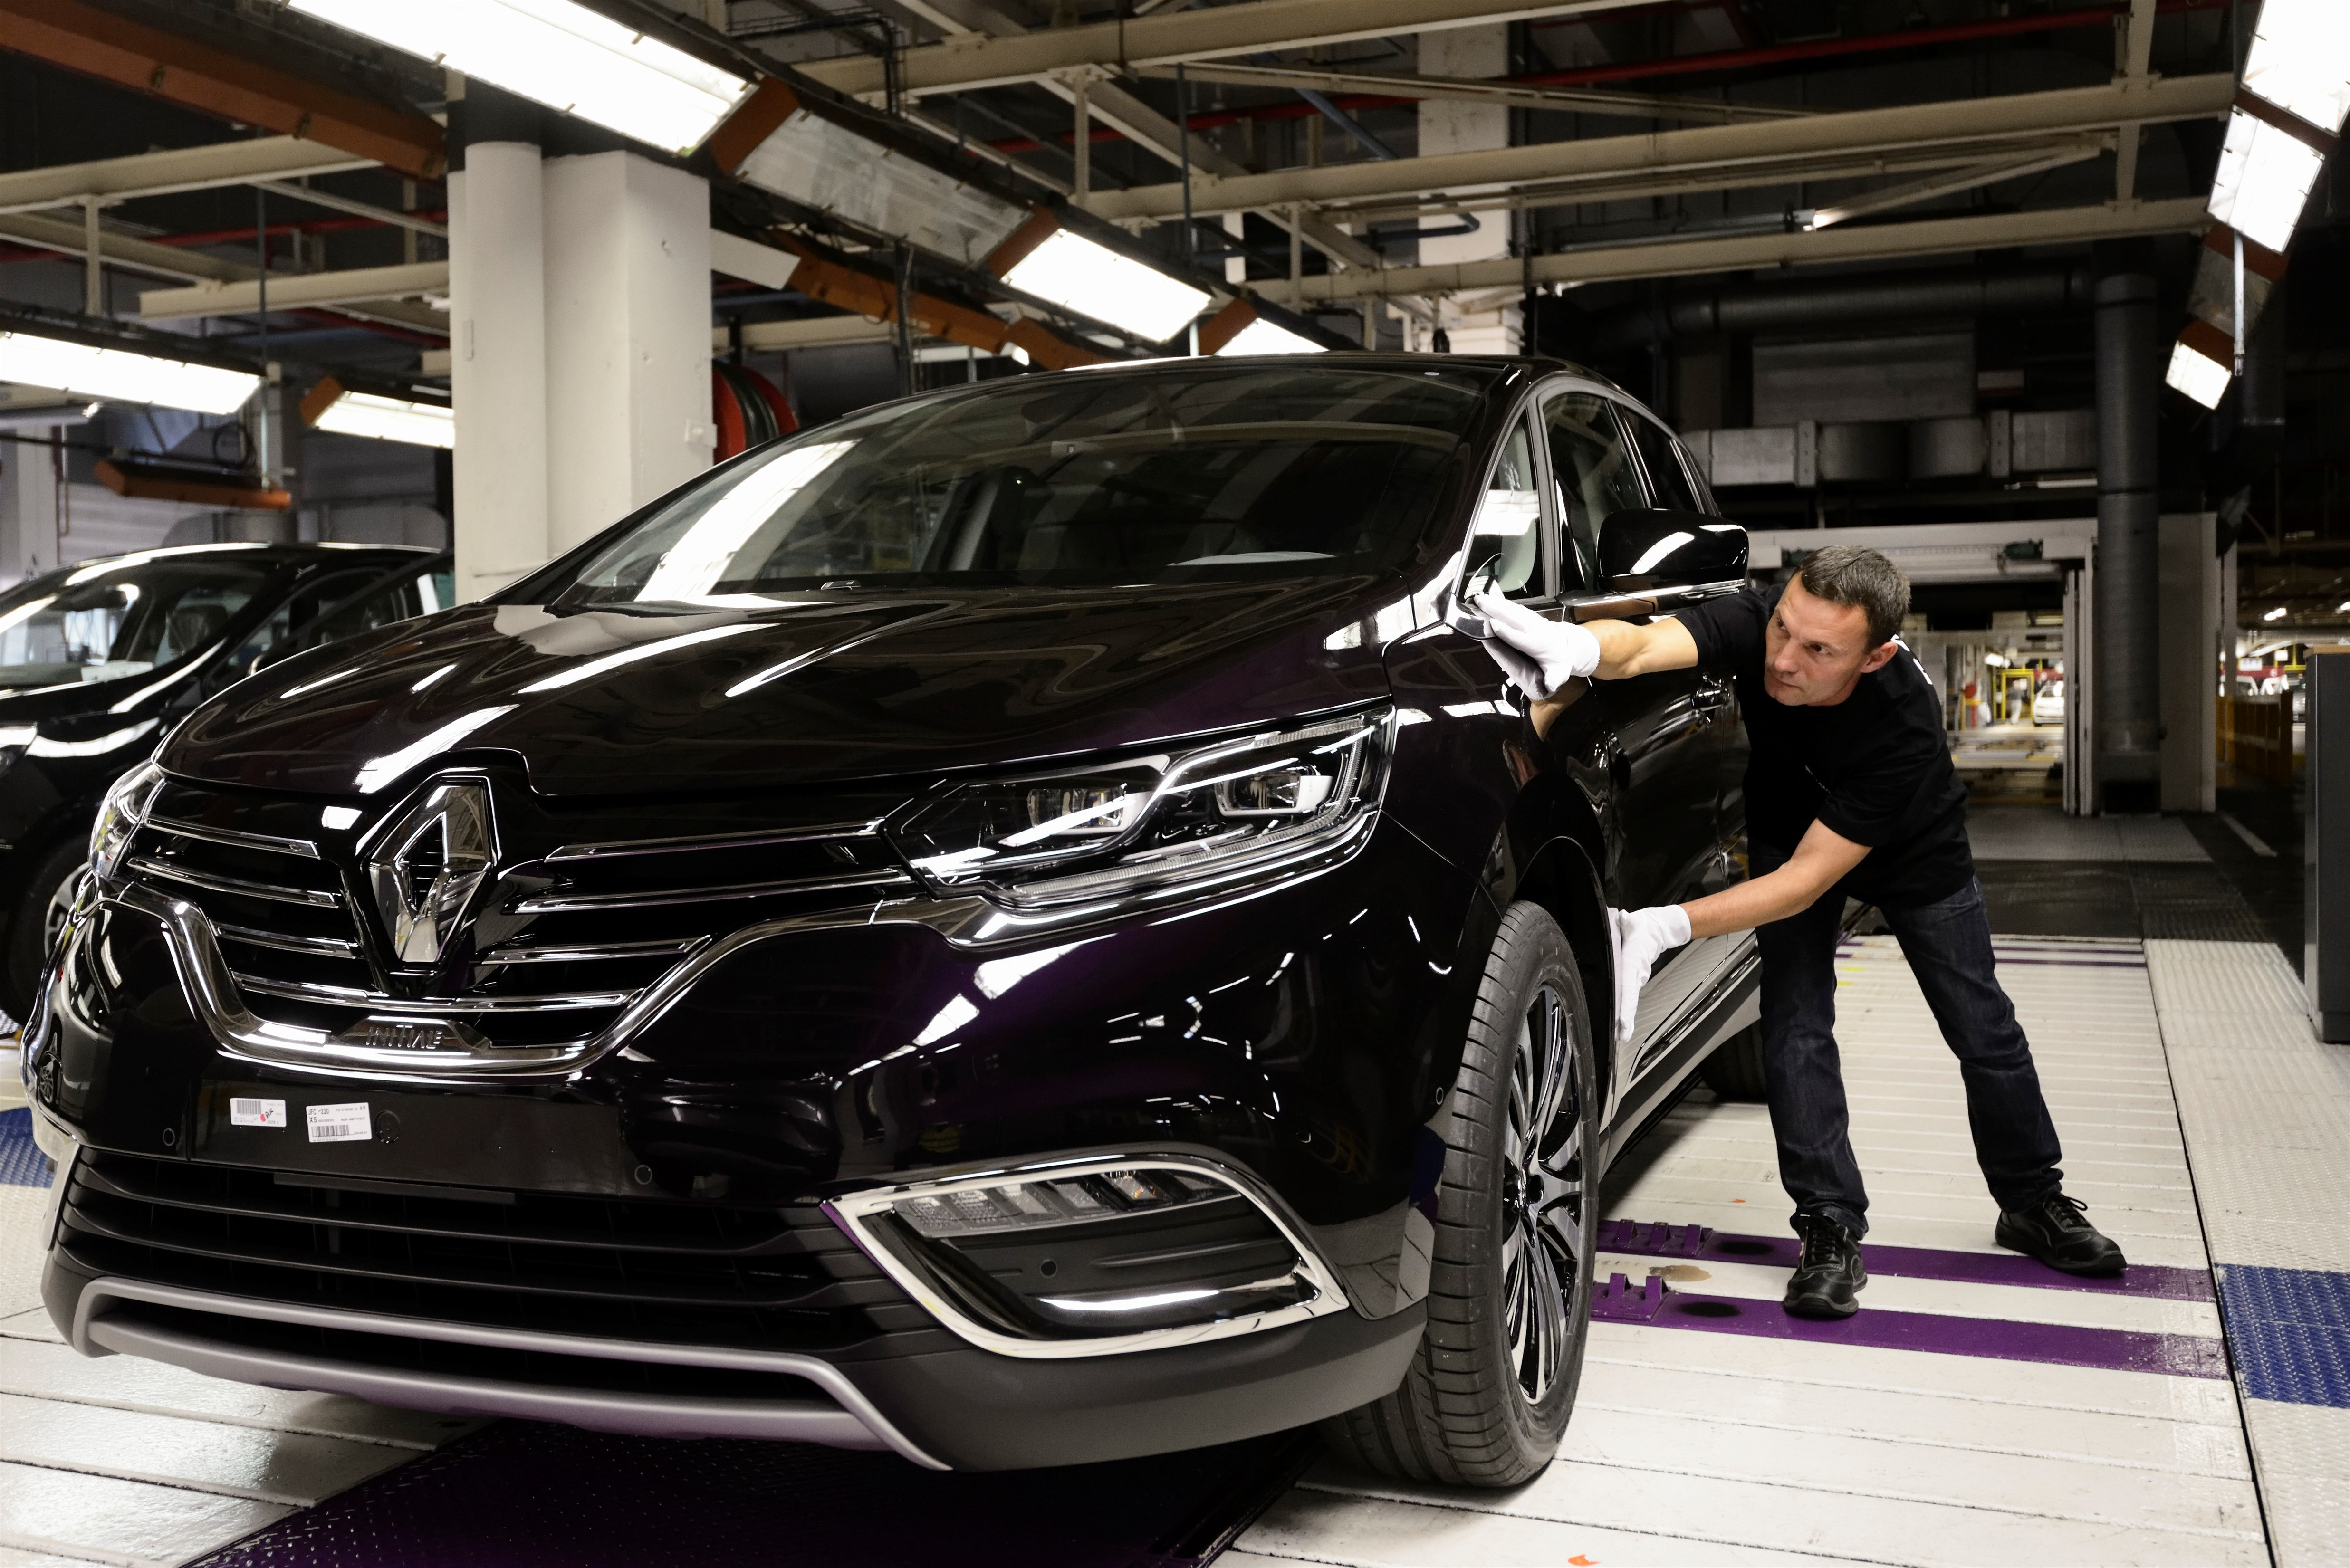 Viaggio a Douai, dove nasce Nuovo Renault Espace